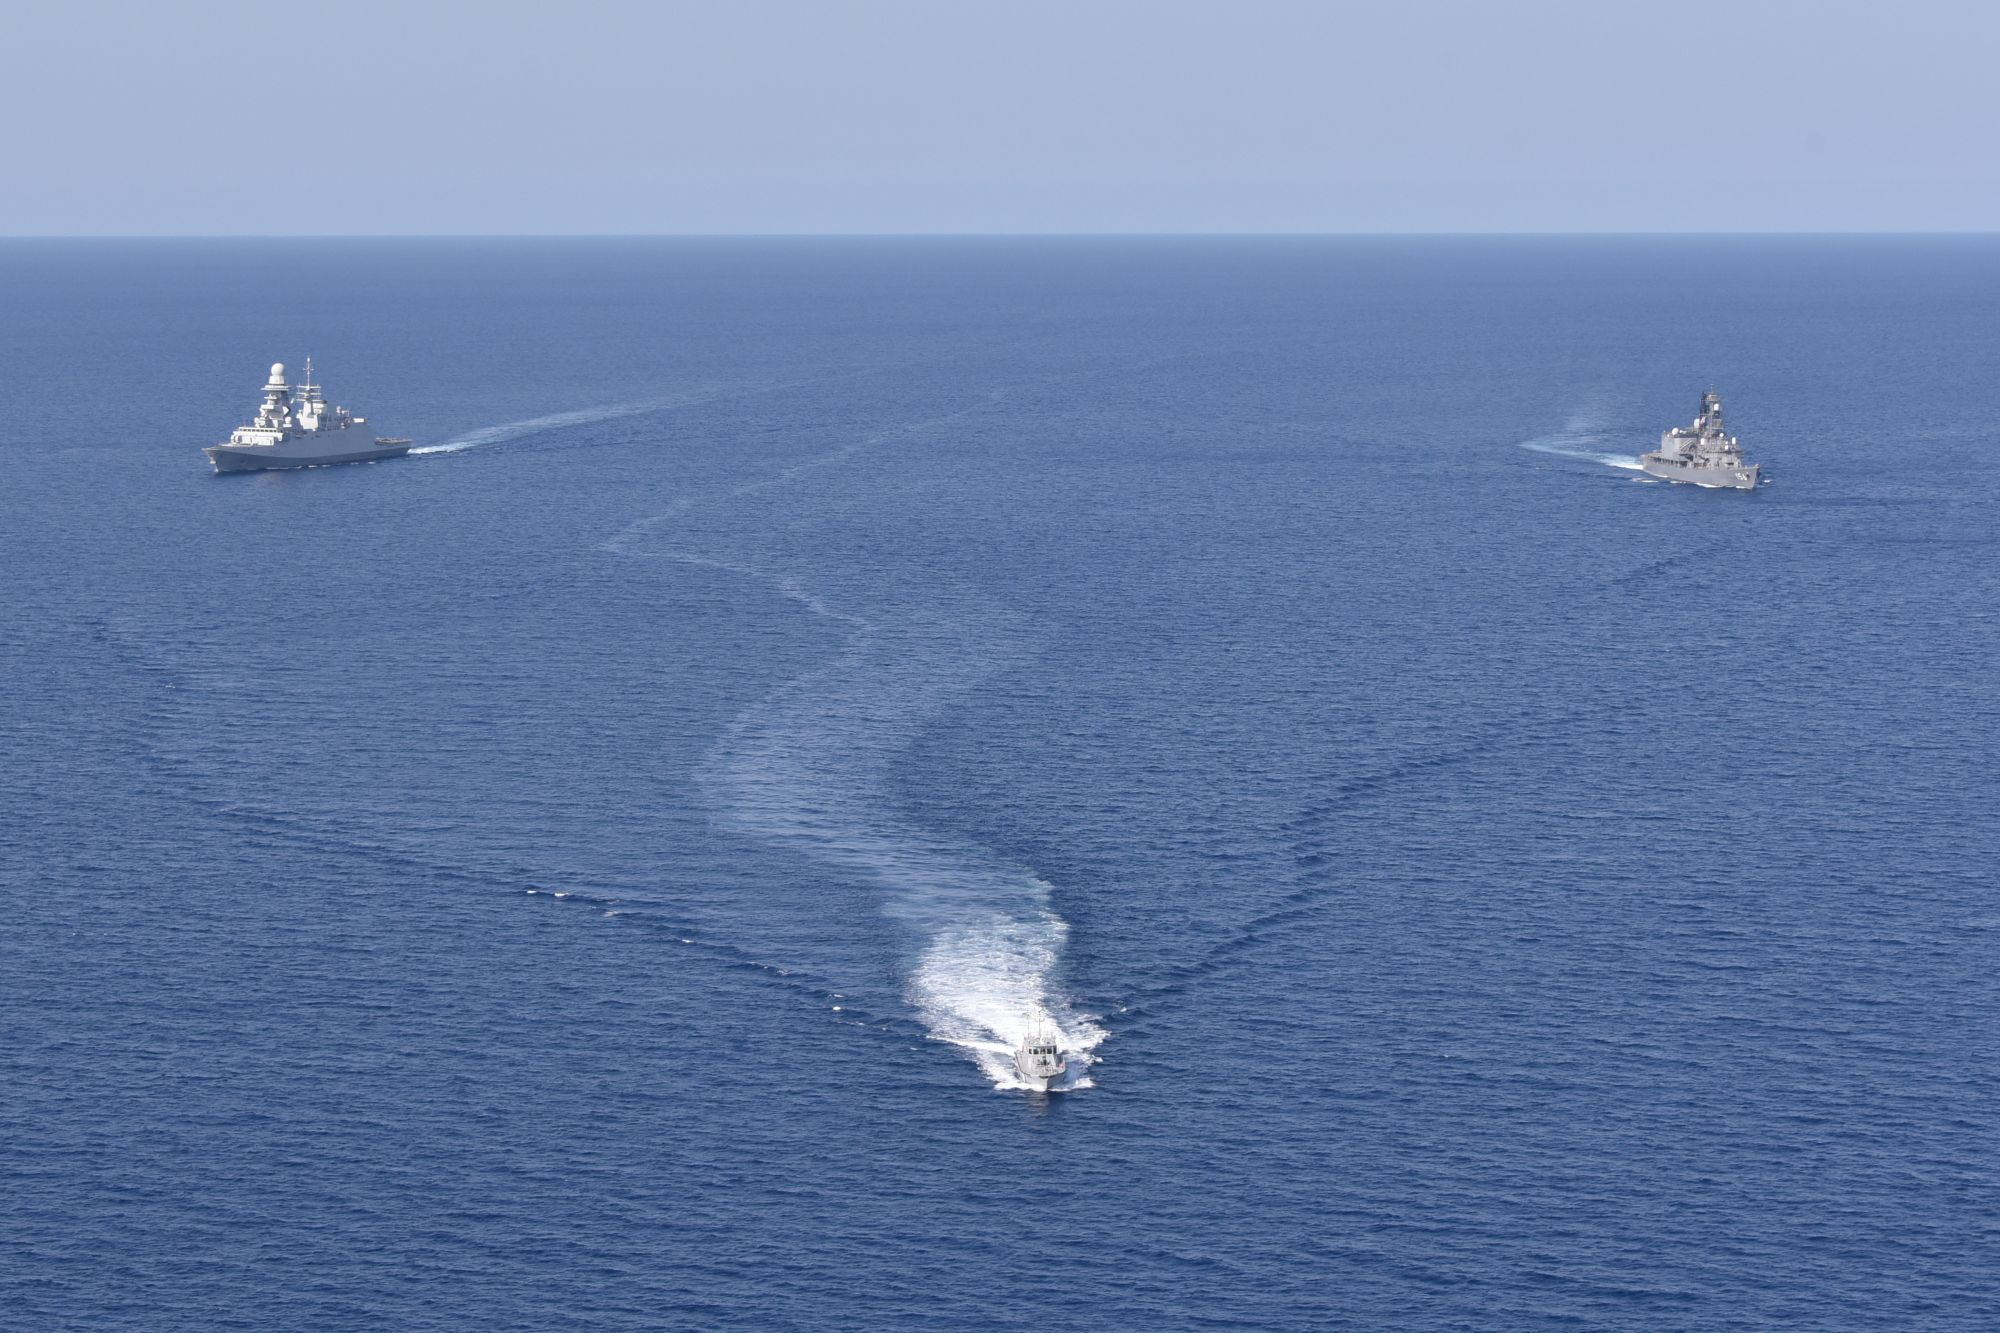 eu japan djibouti exercise 5 - naval post- naval news and information